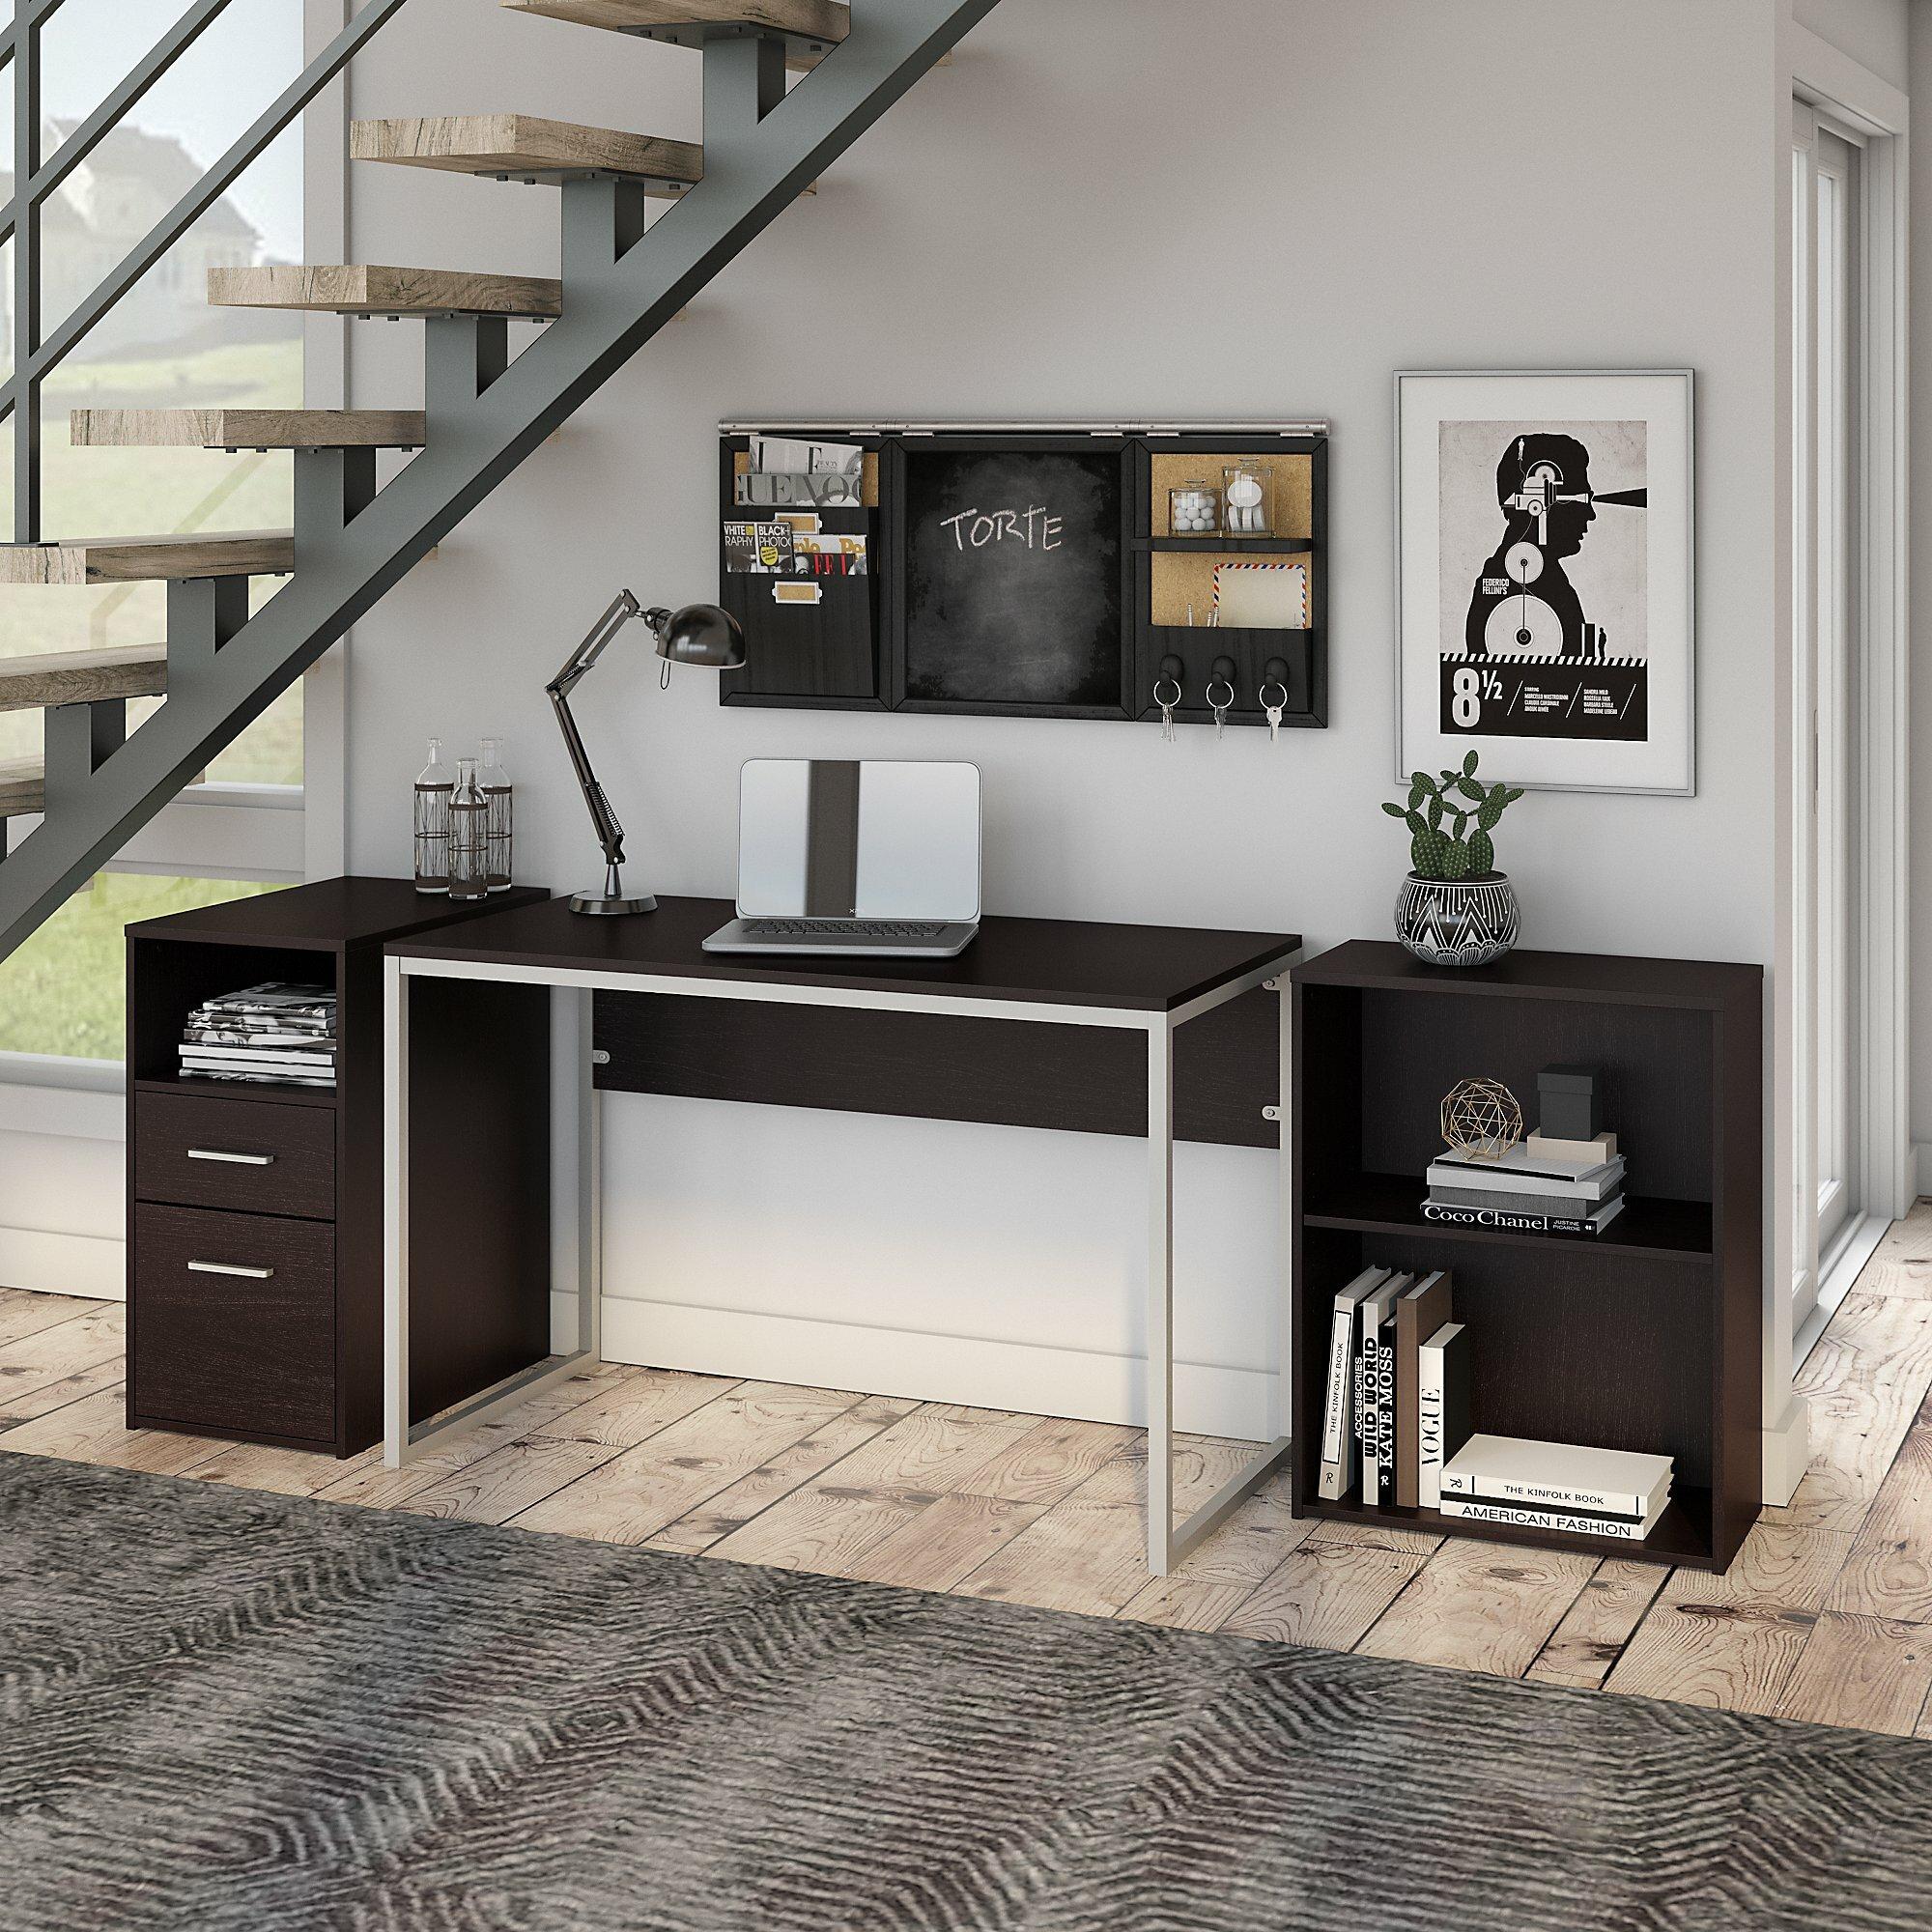 Hesse Small Desk Bookcase And Pedestal Set